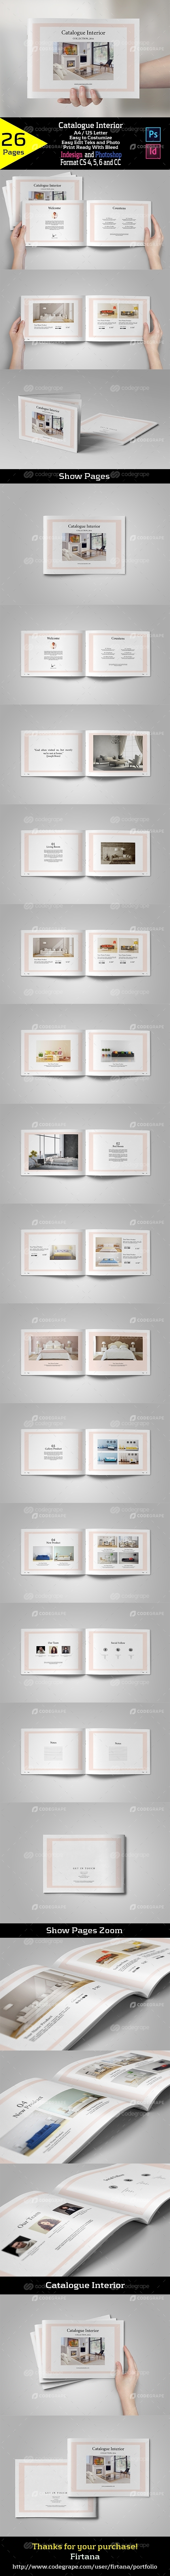 Catalogue Interior